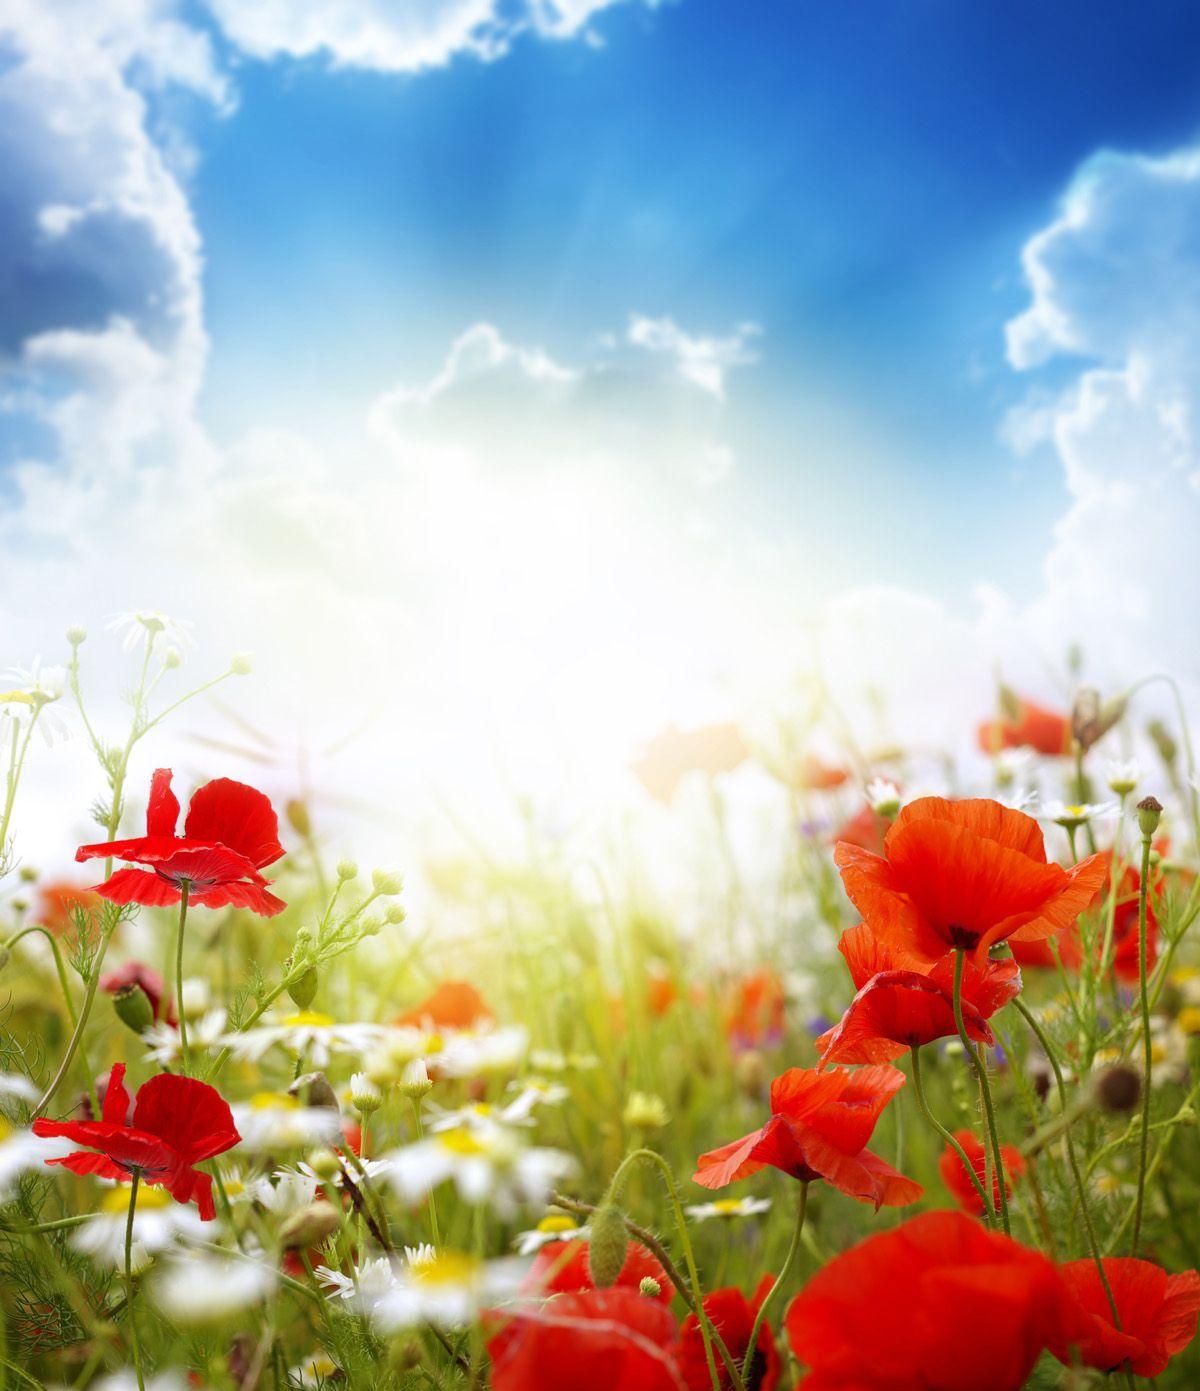 Flower Wallpaper, Beautiful Images